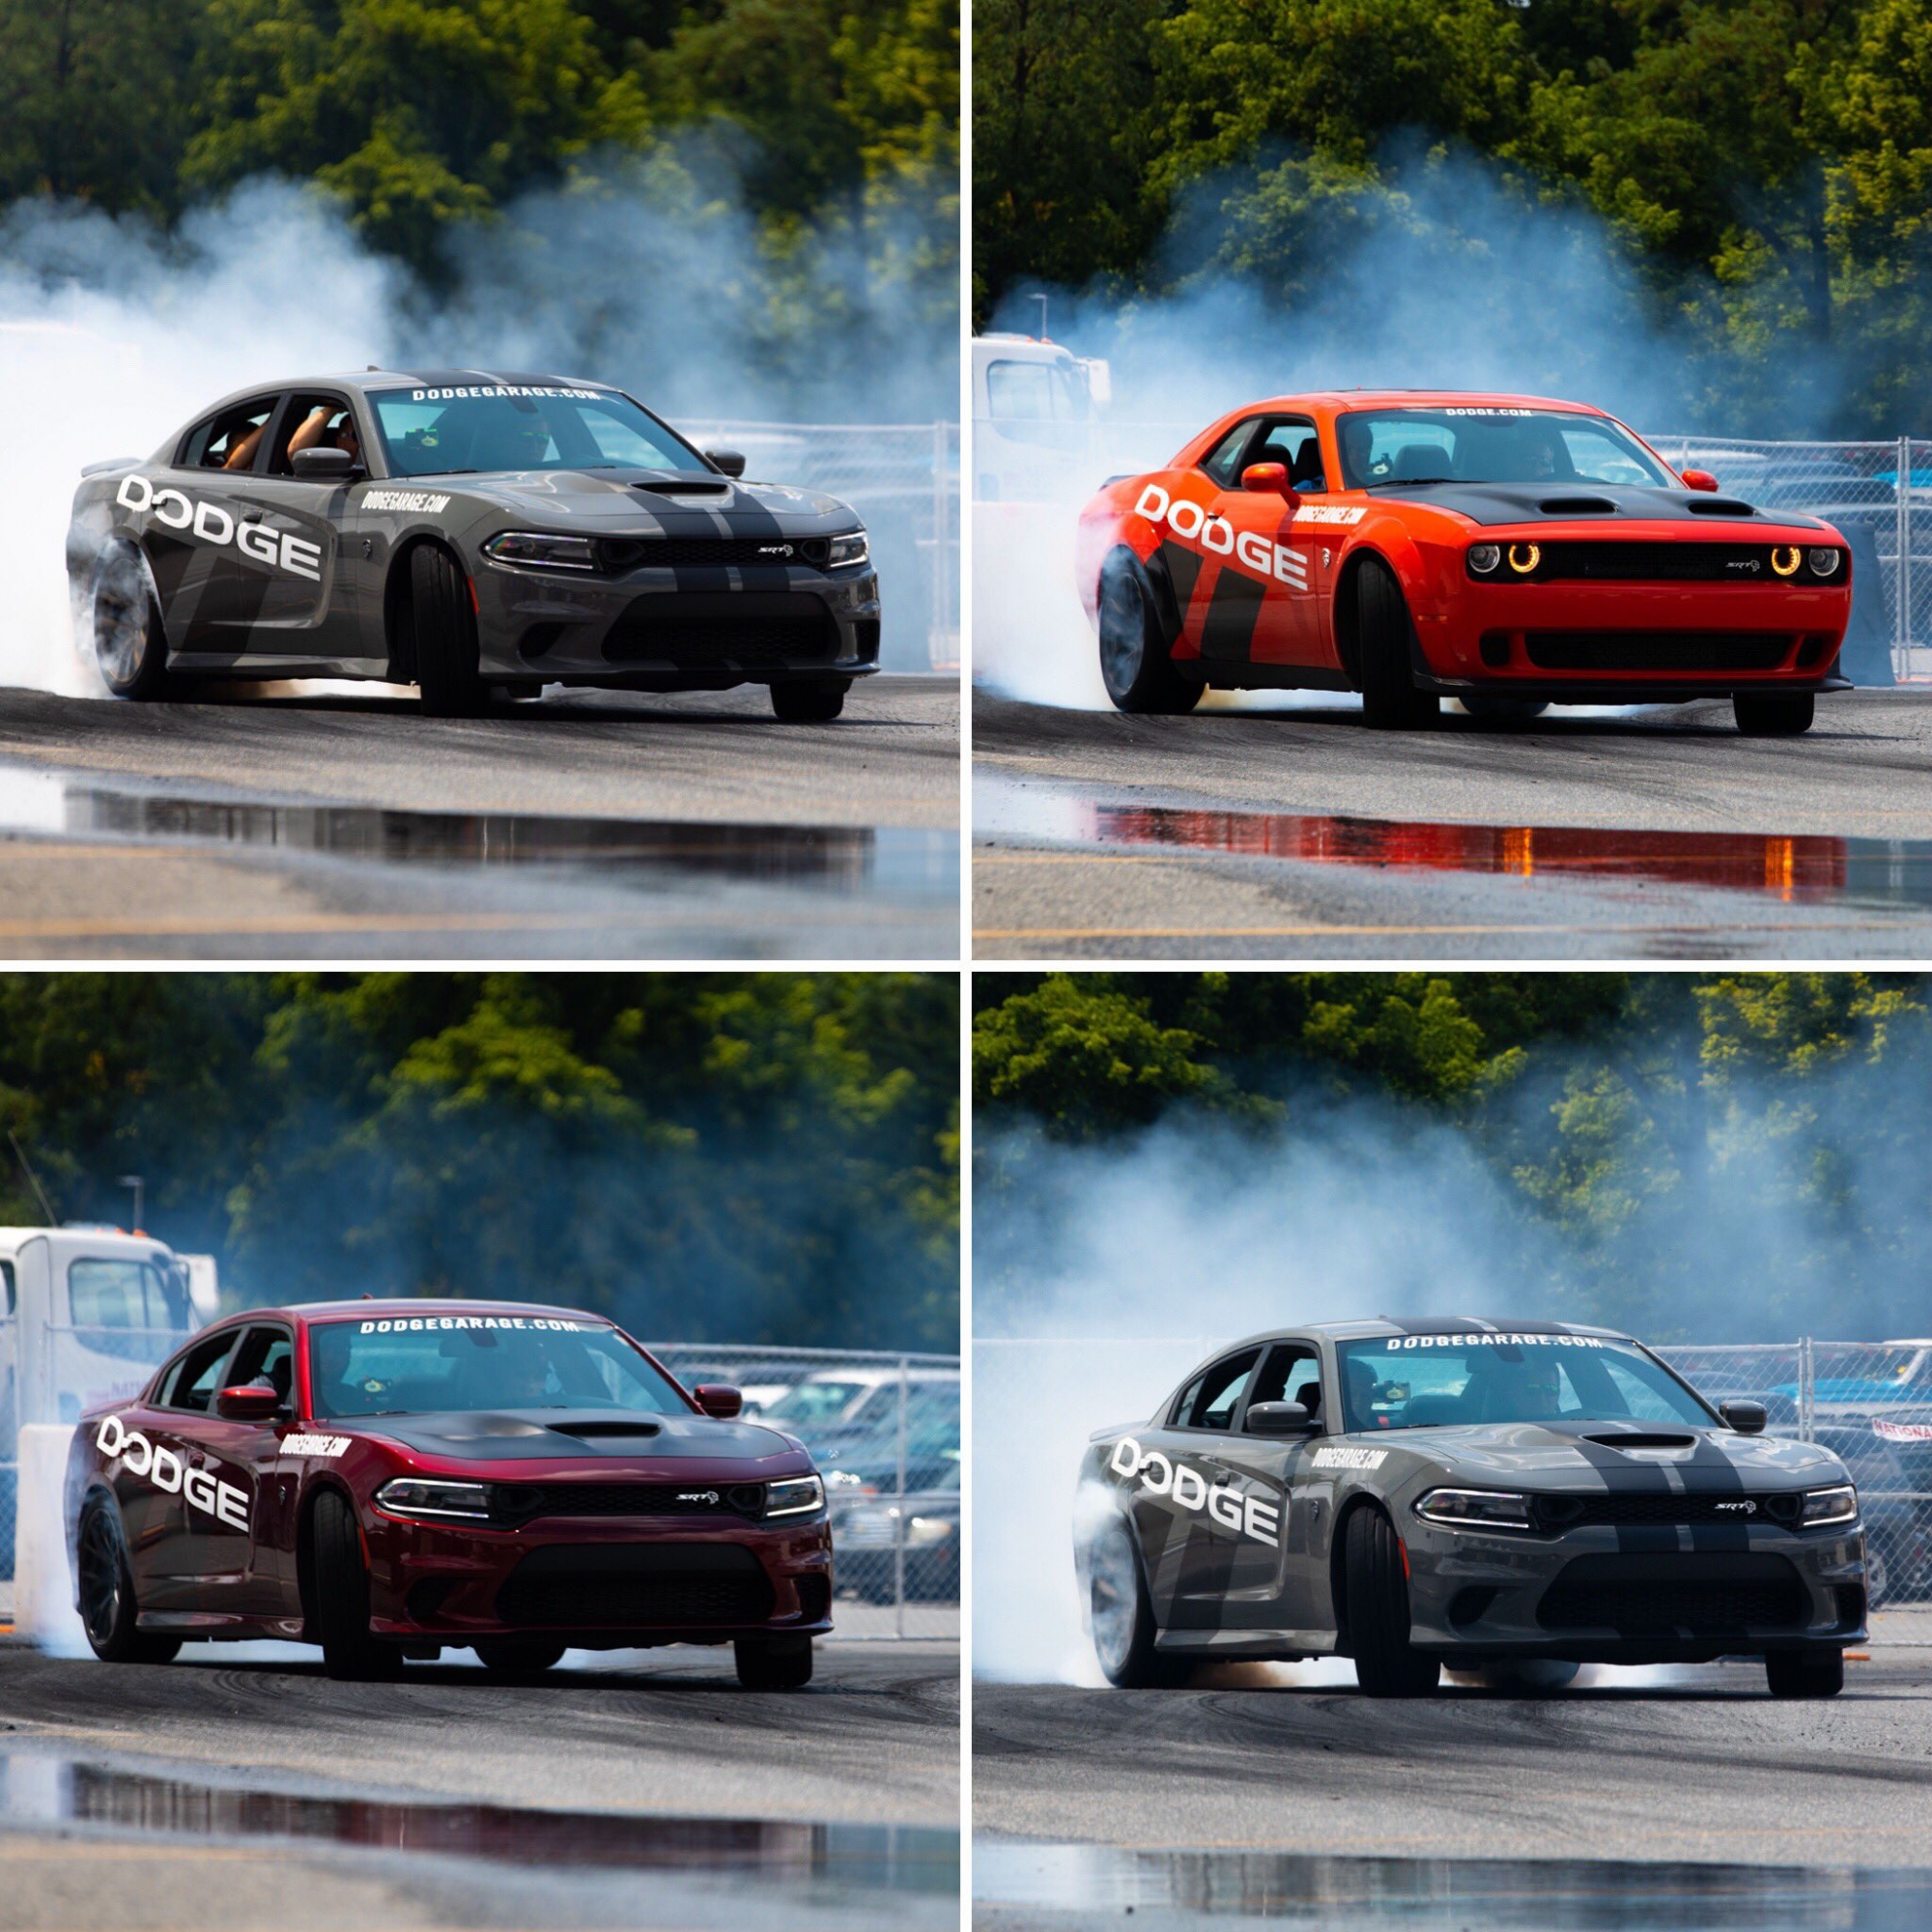 dodge vehicles drifting on a track